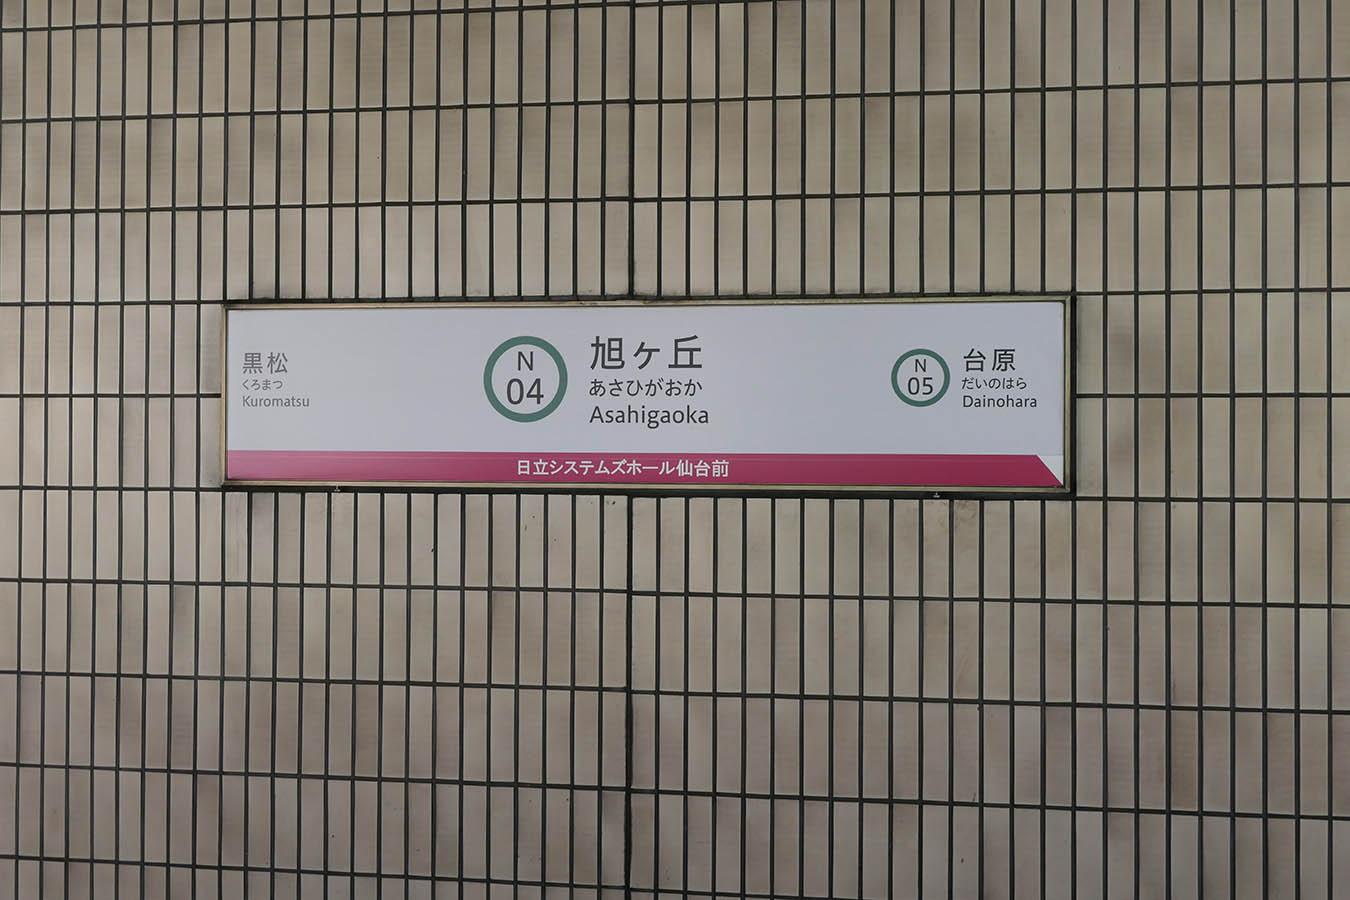 SS-N04_photo03.jpg